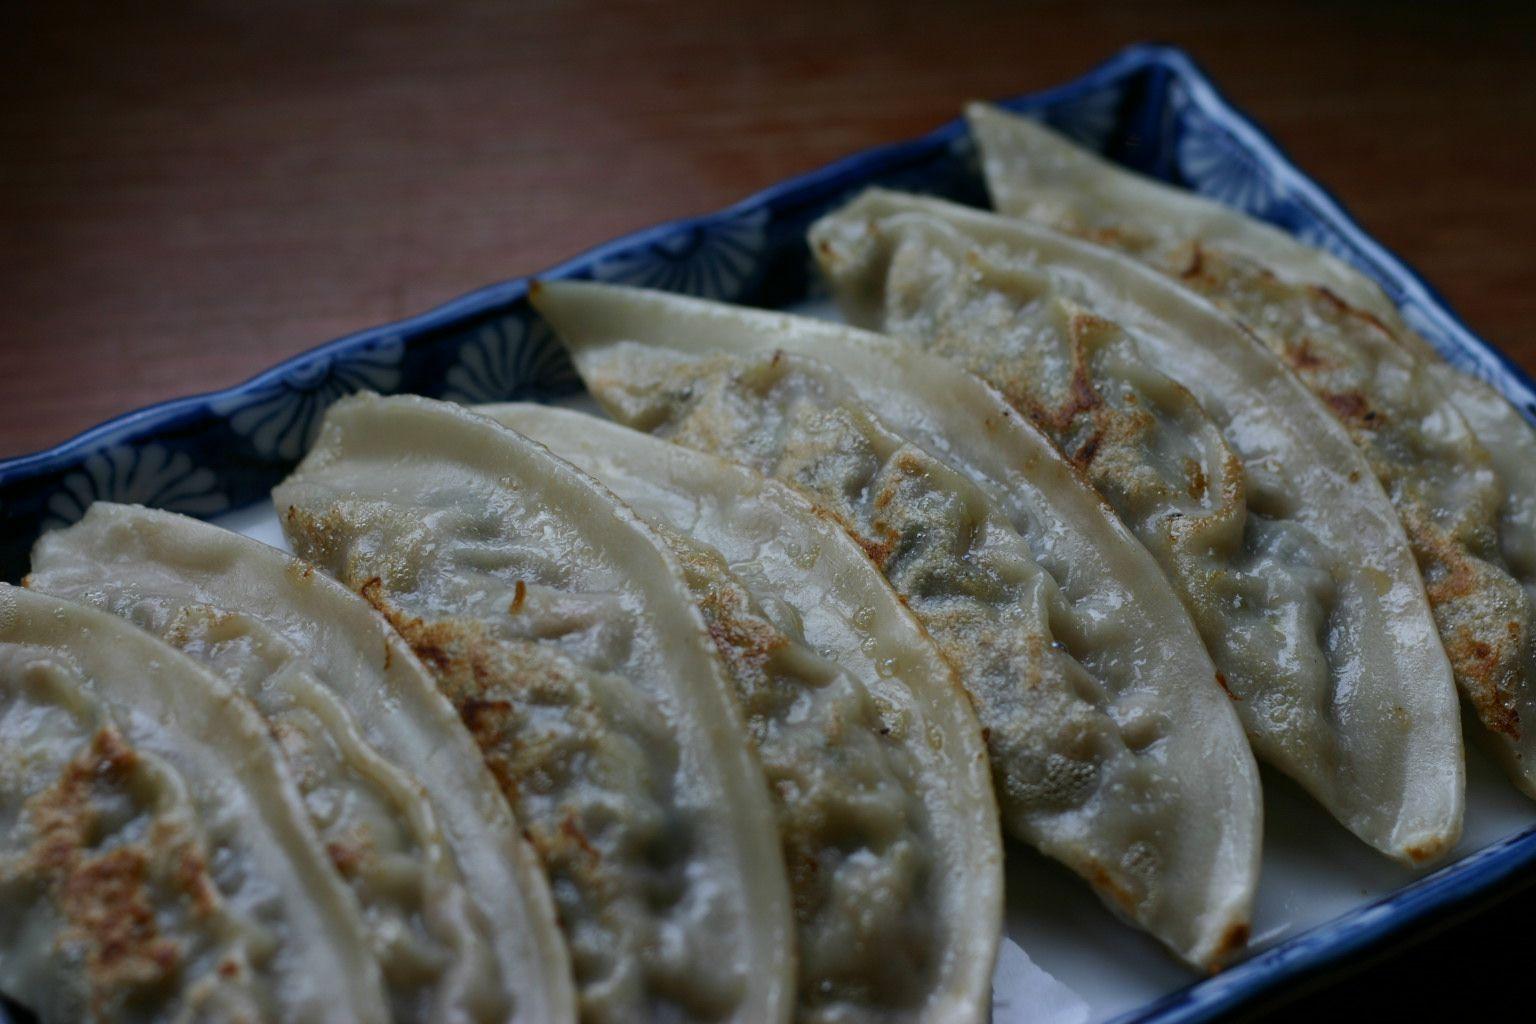 Korean food recipes an easy recipe for yachae mandoo korean vegetable dumplings forumfinder Images